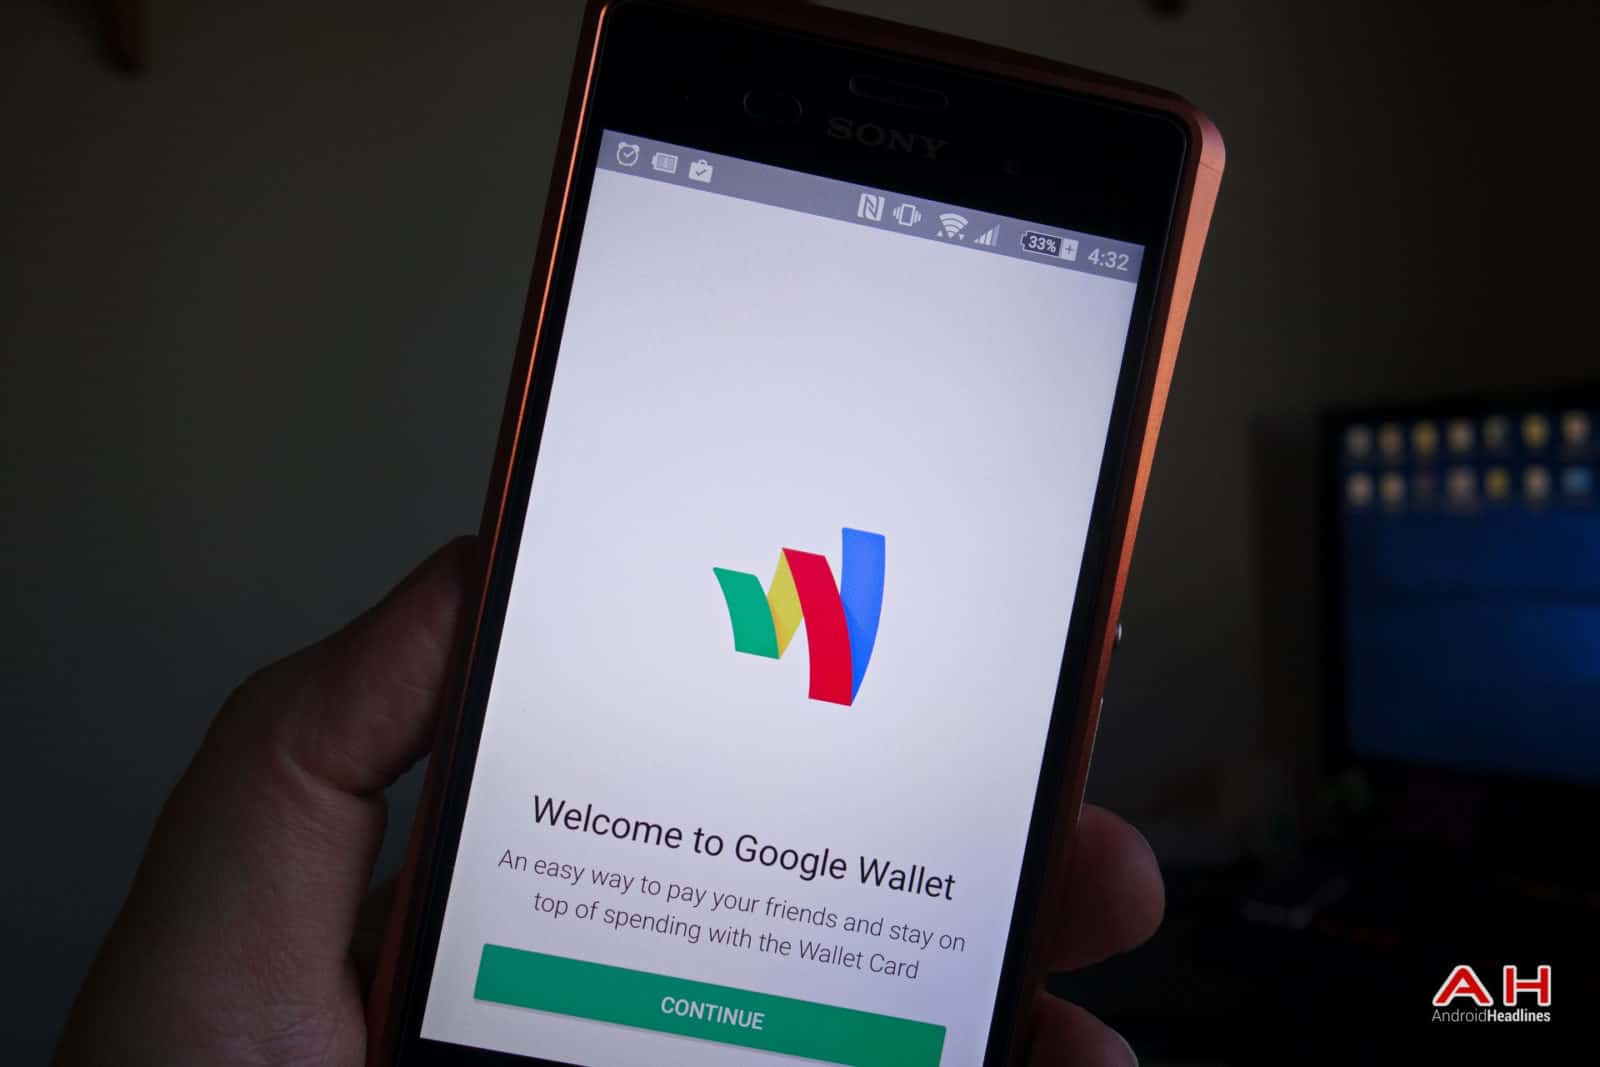 AH Google Wallet New-2